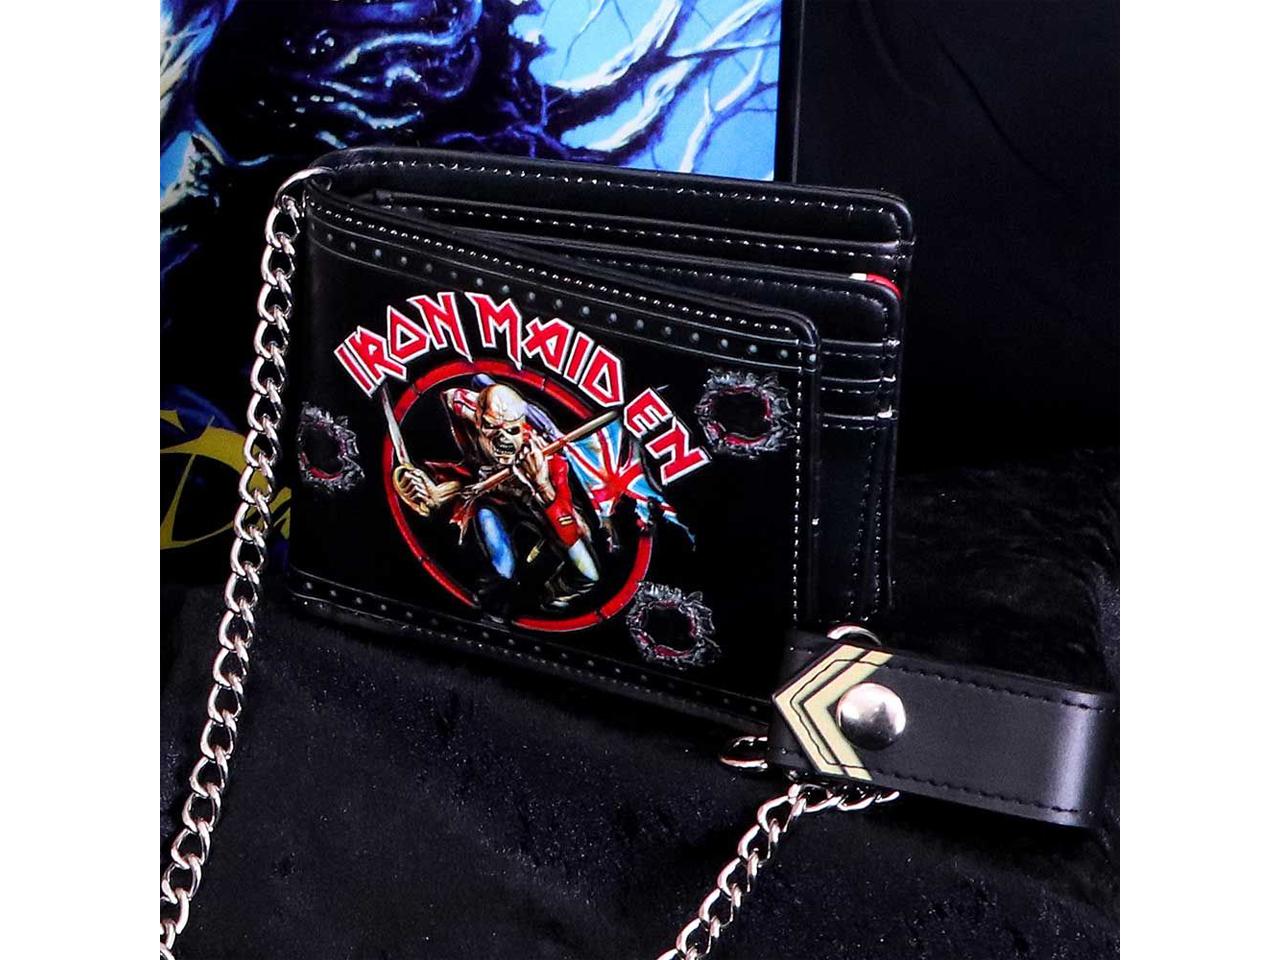 Iron Maiden Eddie Trooper Iconic Band Wallet Chain Merch Music Rock Metal Emo